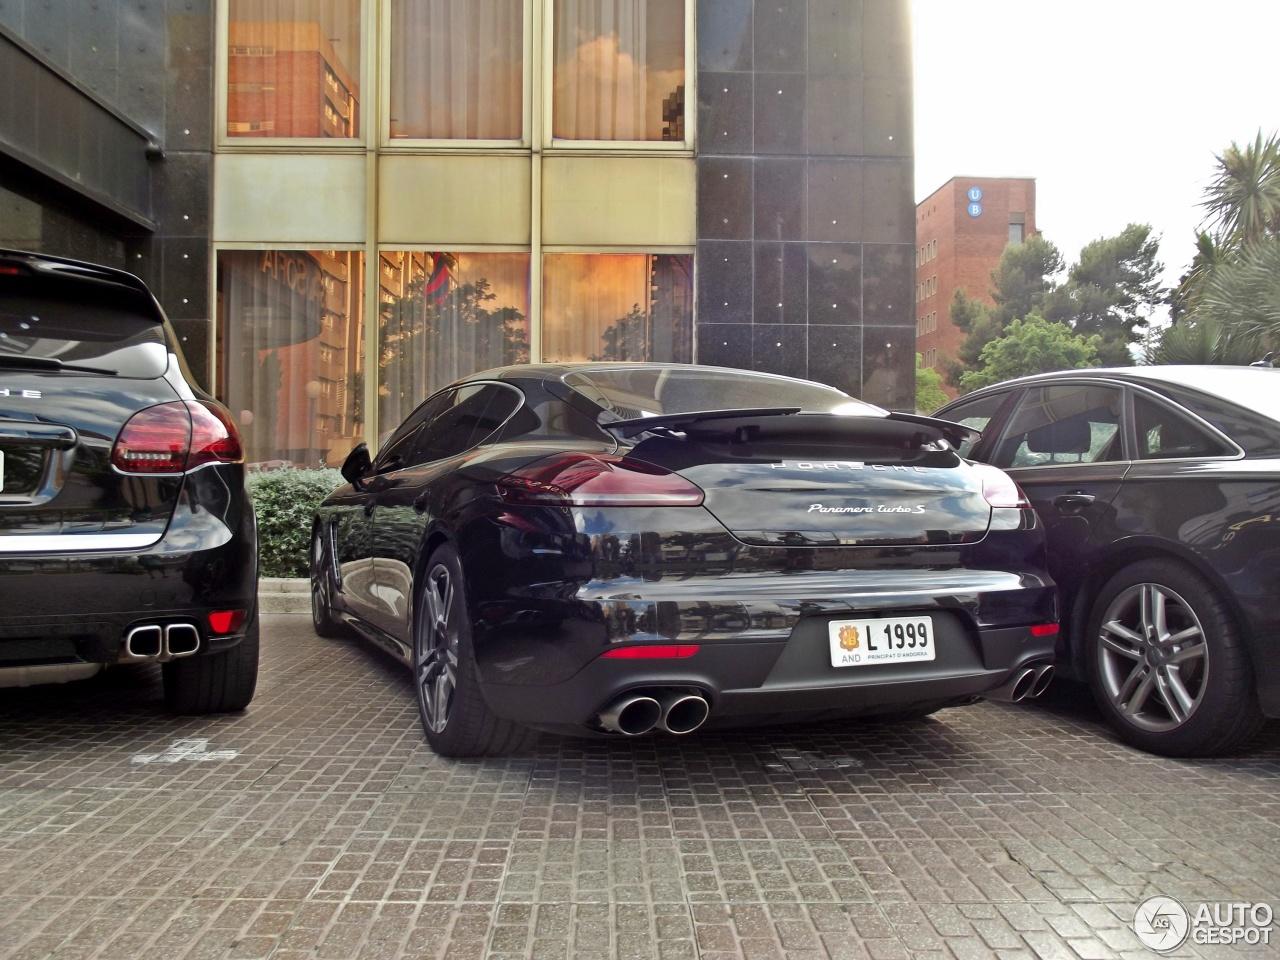 Porsche Panamera Turbo S Executive Mkii 17 May 2014